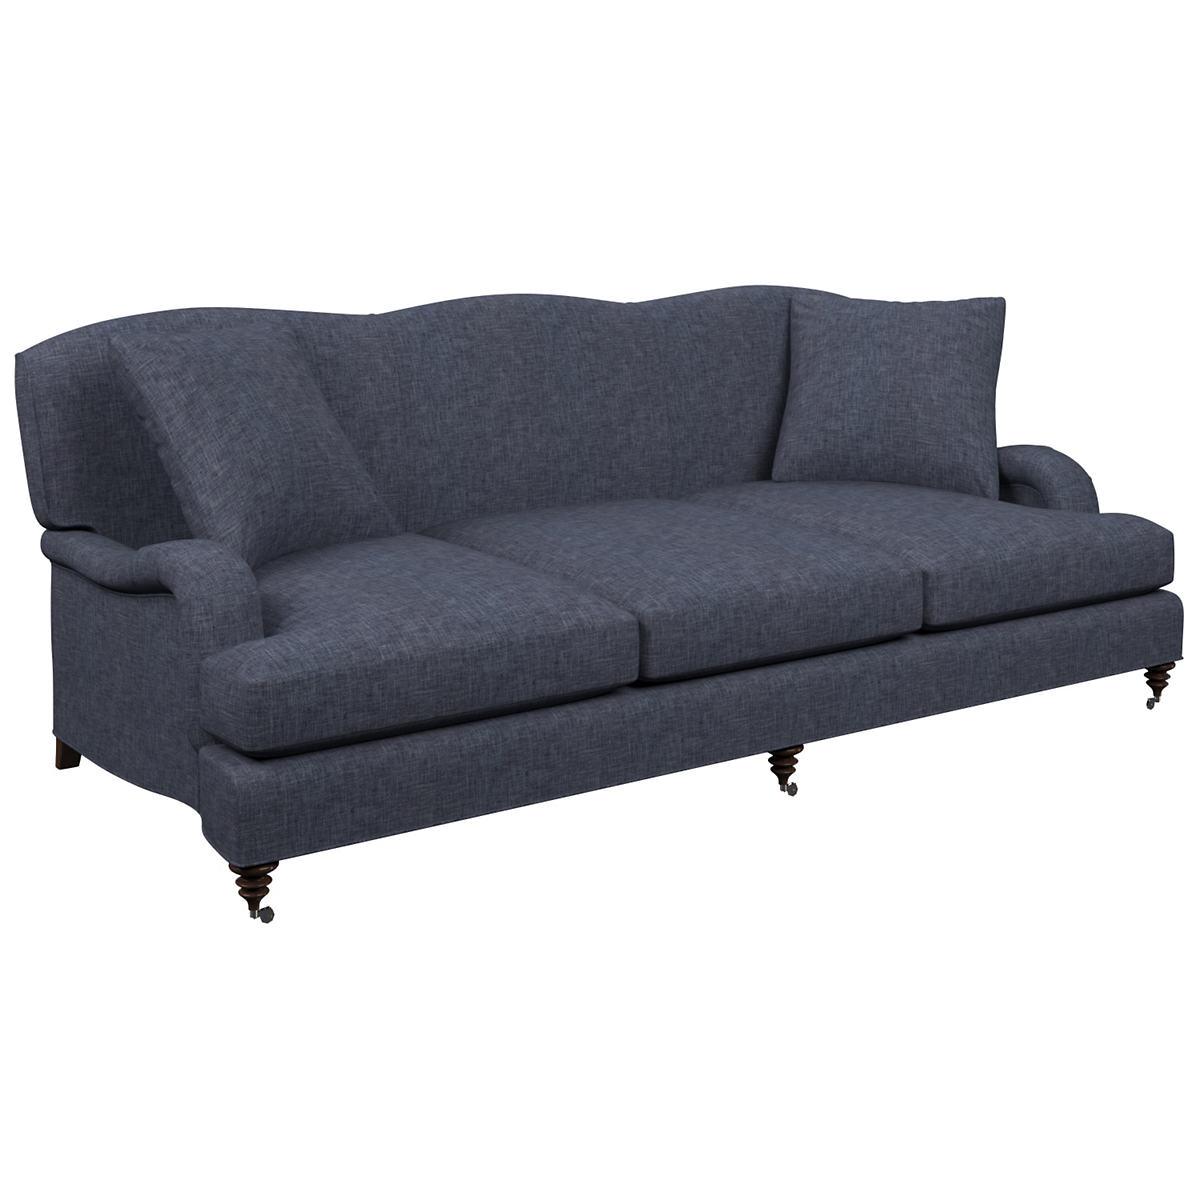 Greylock Navy Litchfield 3 Seater Sofa